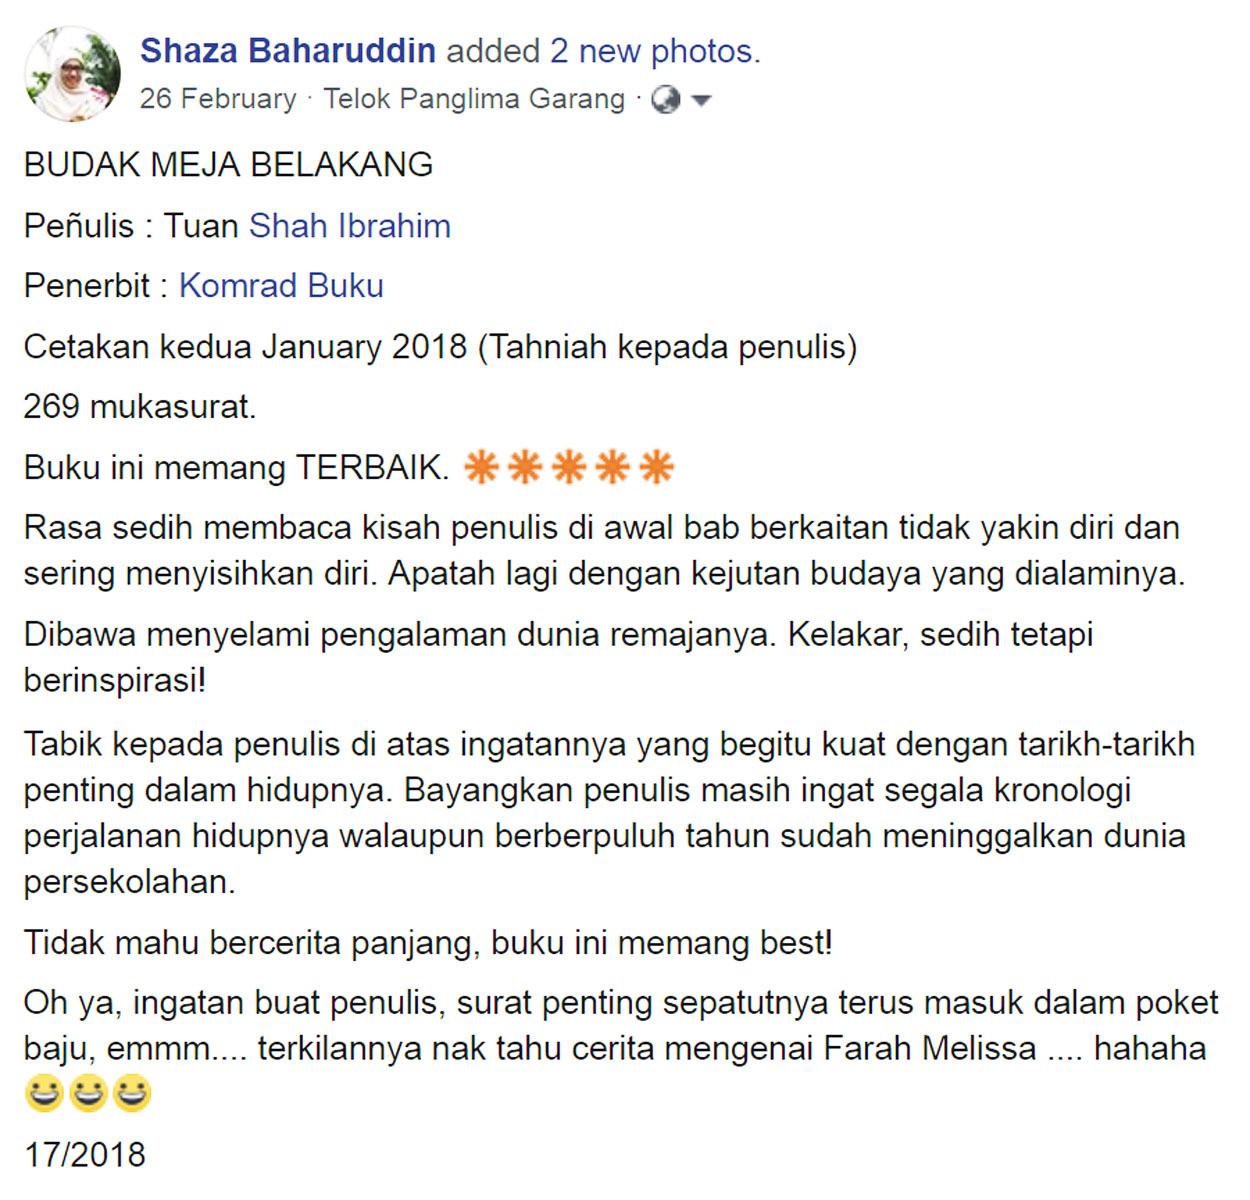 Shaza Baharuddin Ulasan Budak Meja Belakang blog csf